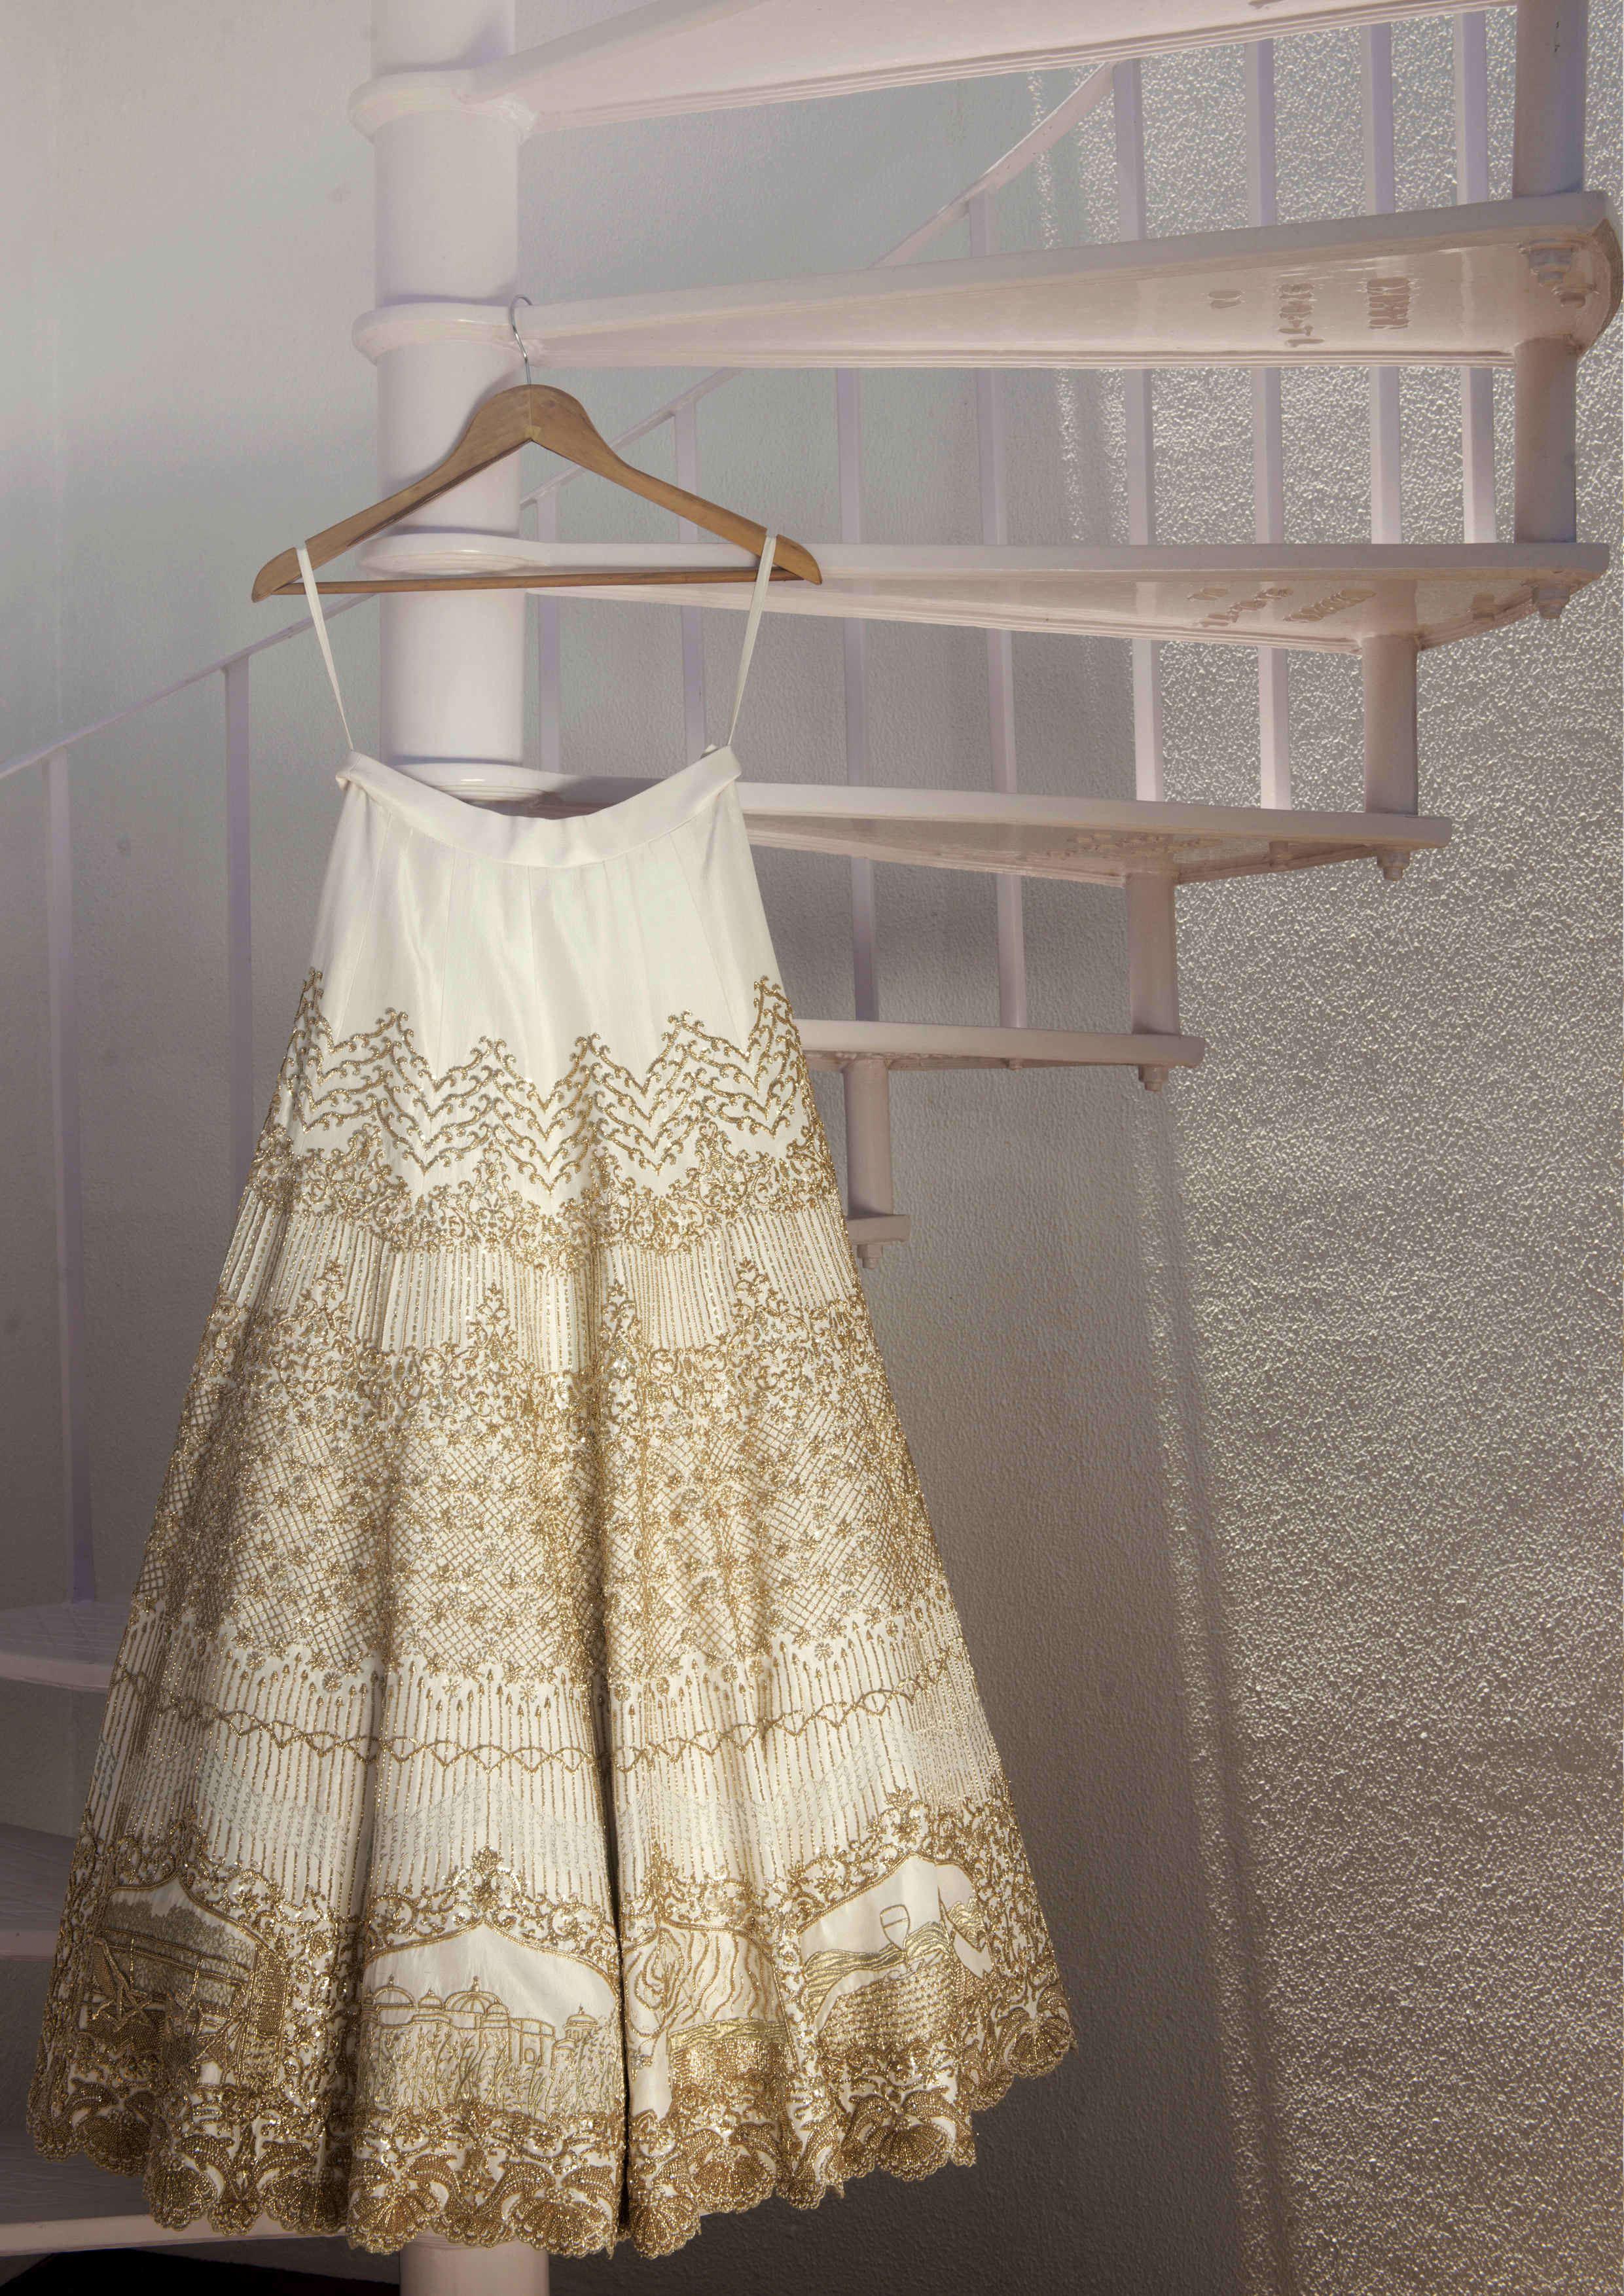 the grand wedding outfit!:tribhovandas bhimji zaveri ltd., namrata soni makup artist